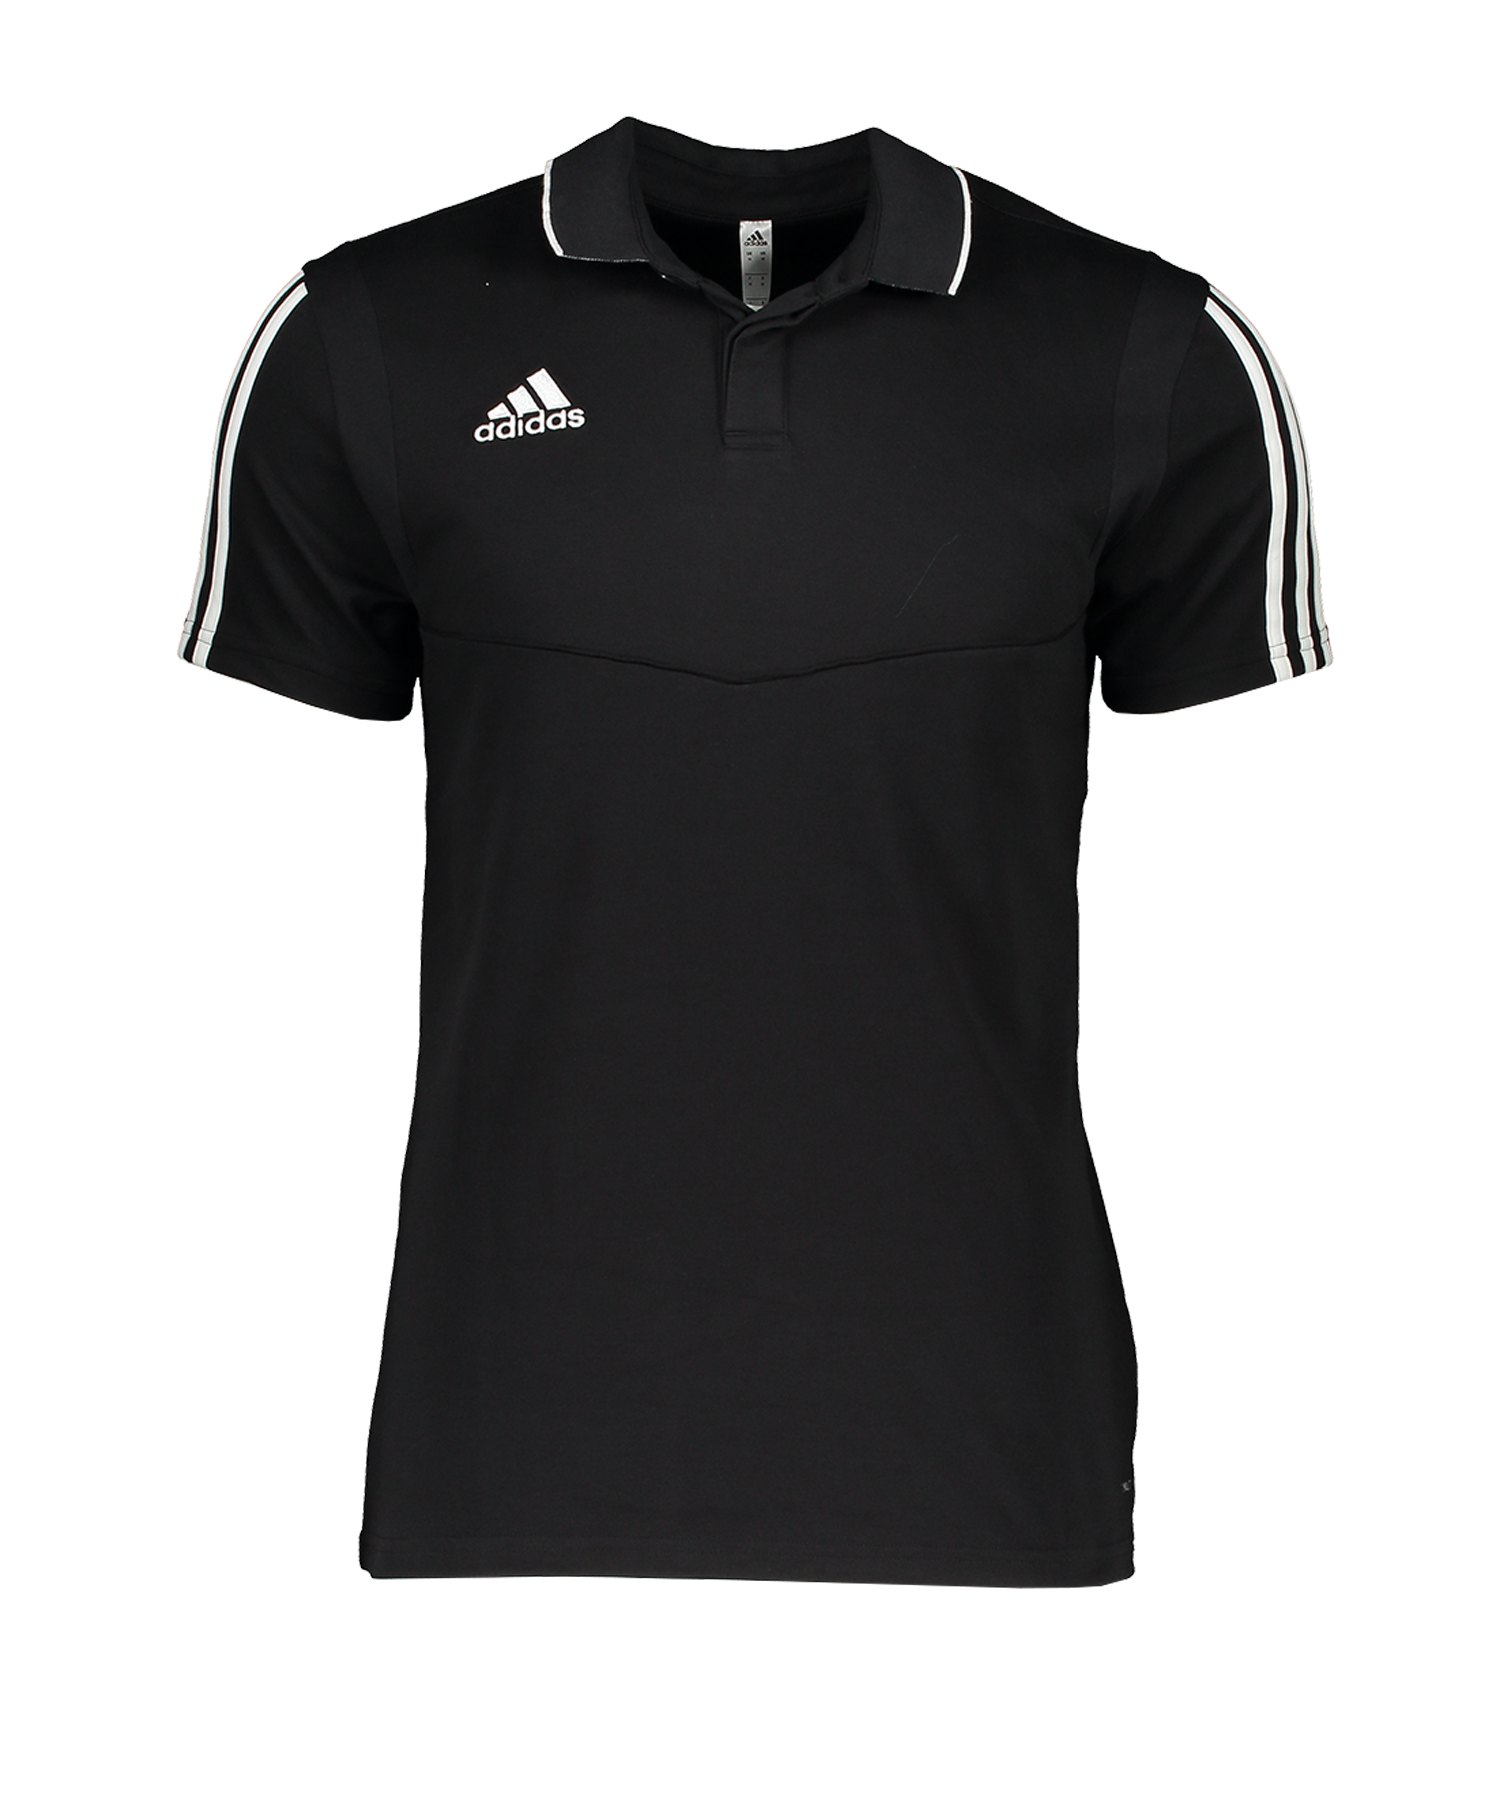 adidas Tiro 19 Poloshirt Schwarz Weiss - schwarz